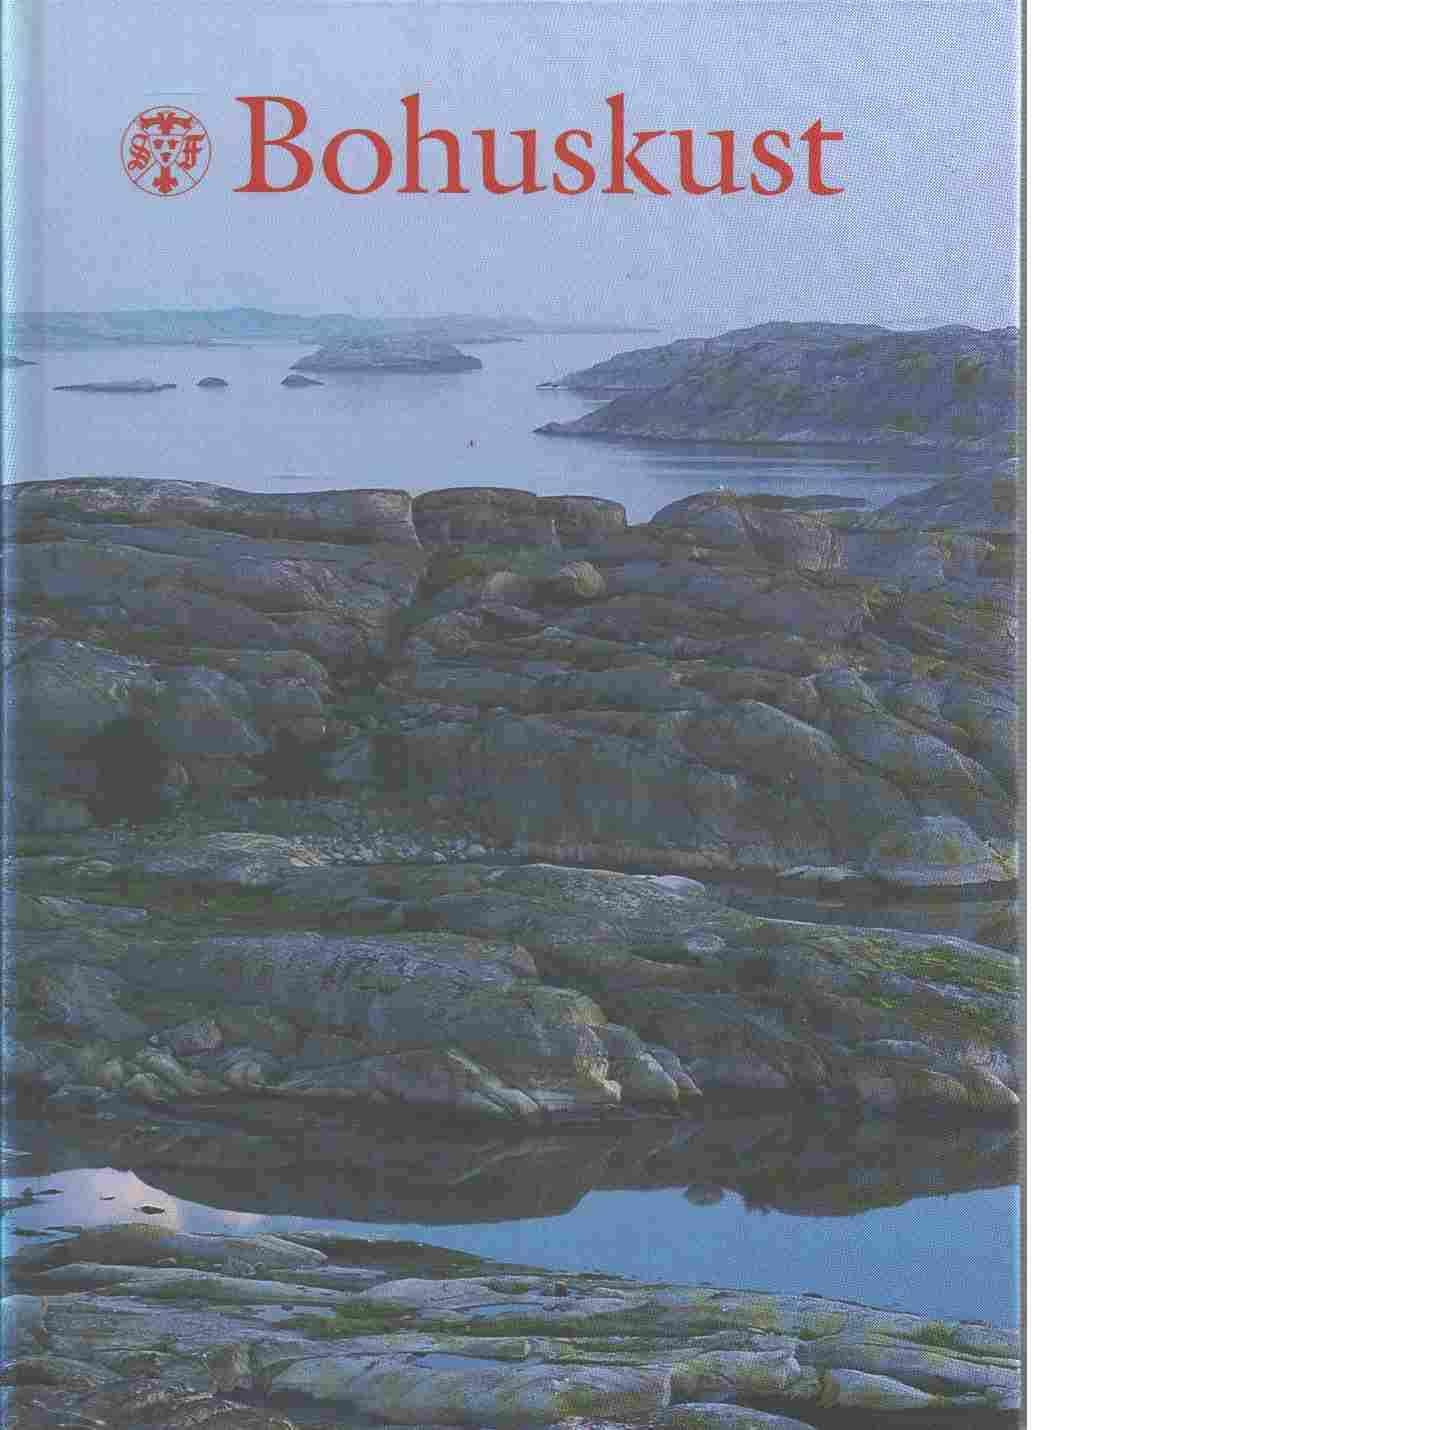 STF:s årsskrift 1992 - Bohustkust - Red.